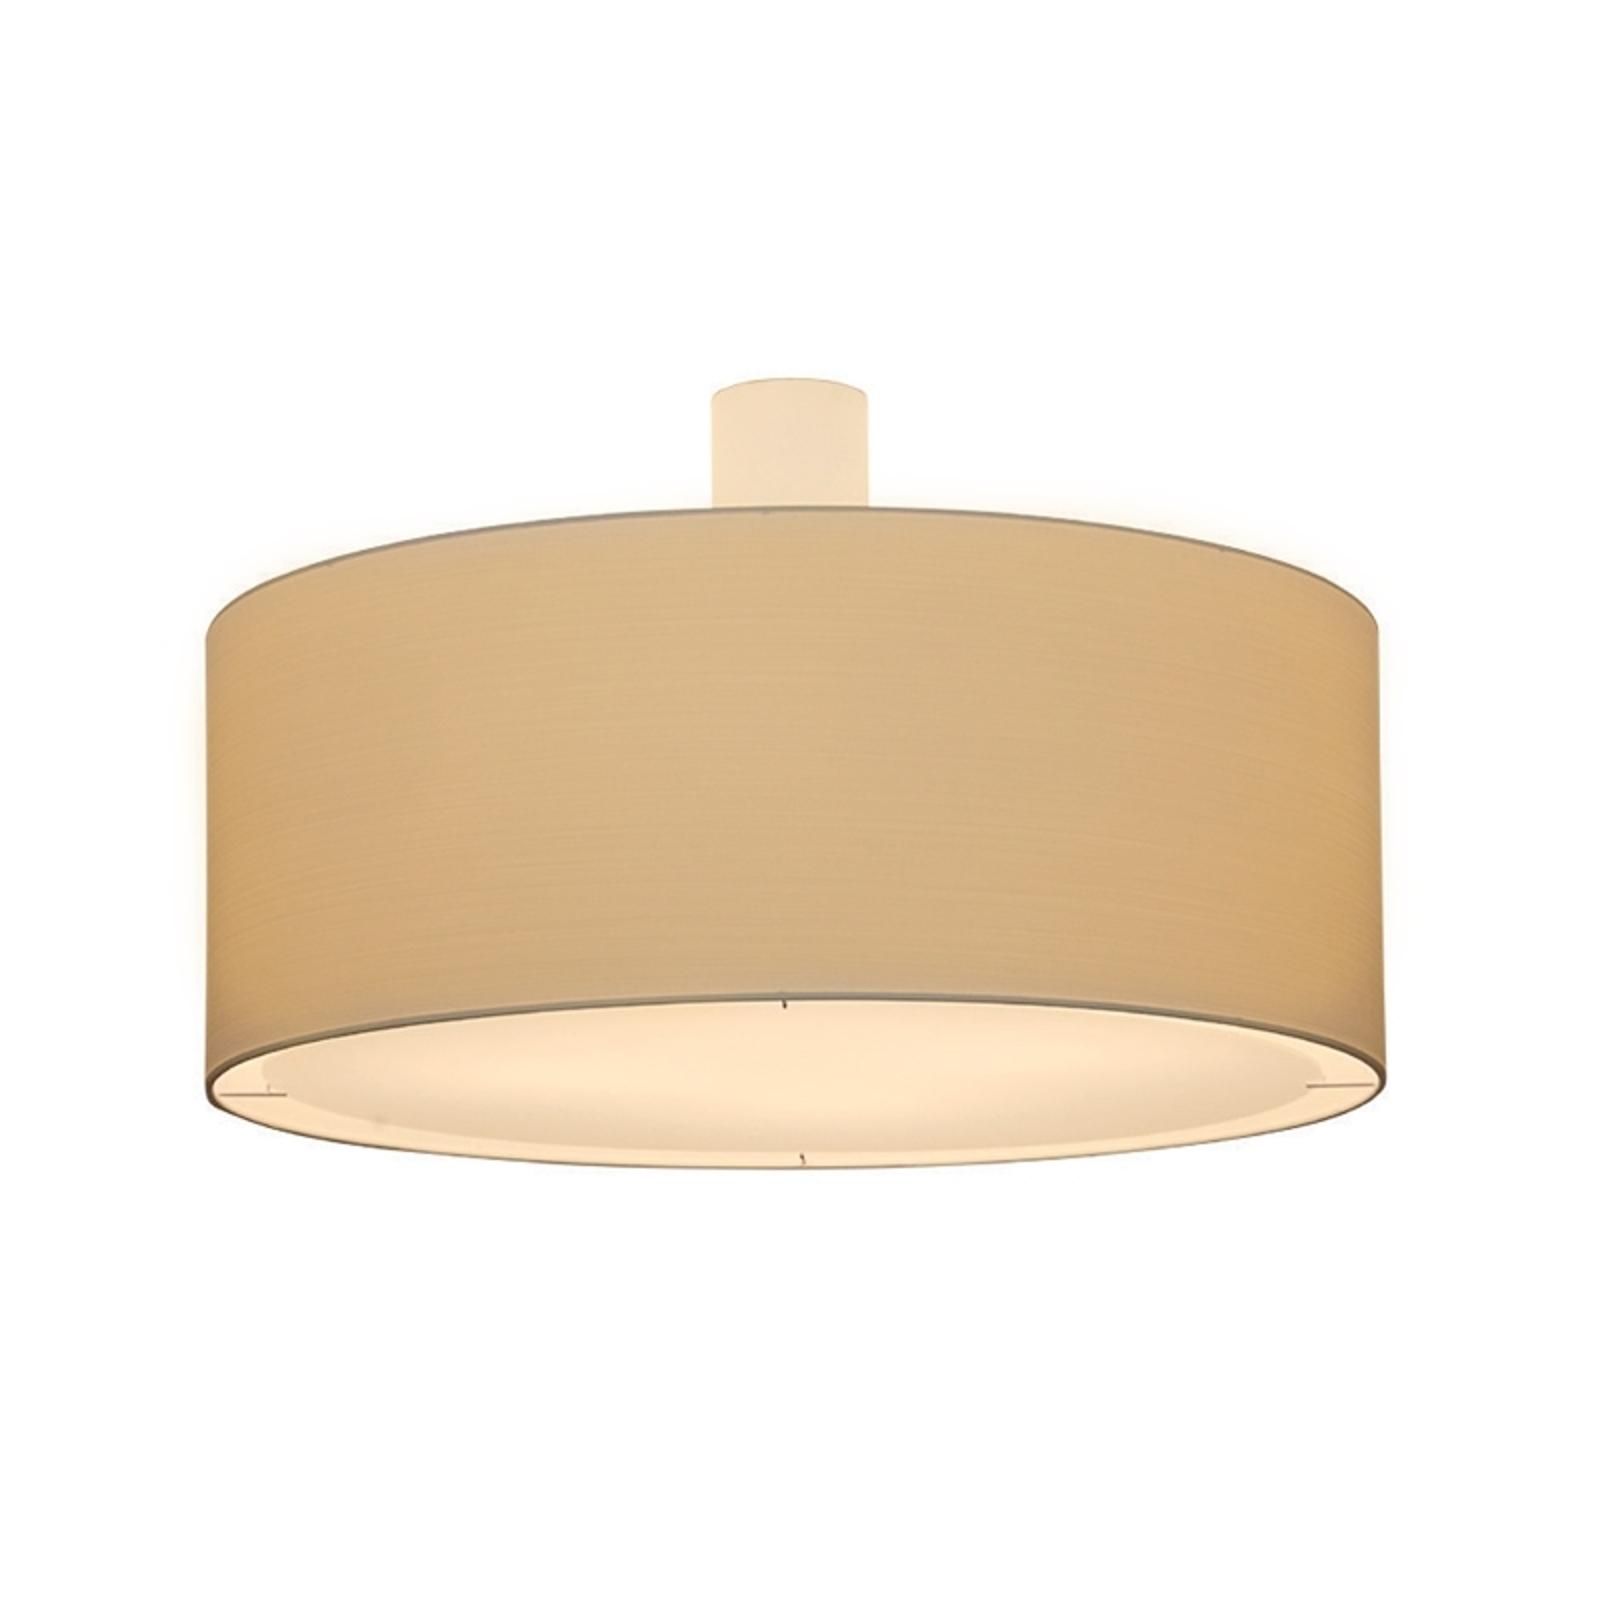 Kremfarget taklampe LIVING ELEGANT Ø 60 cm